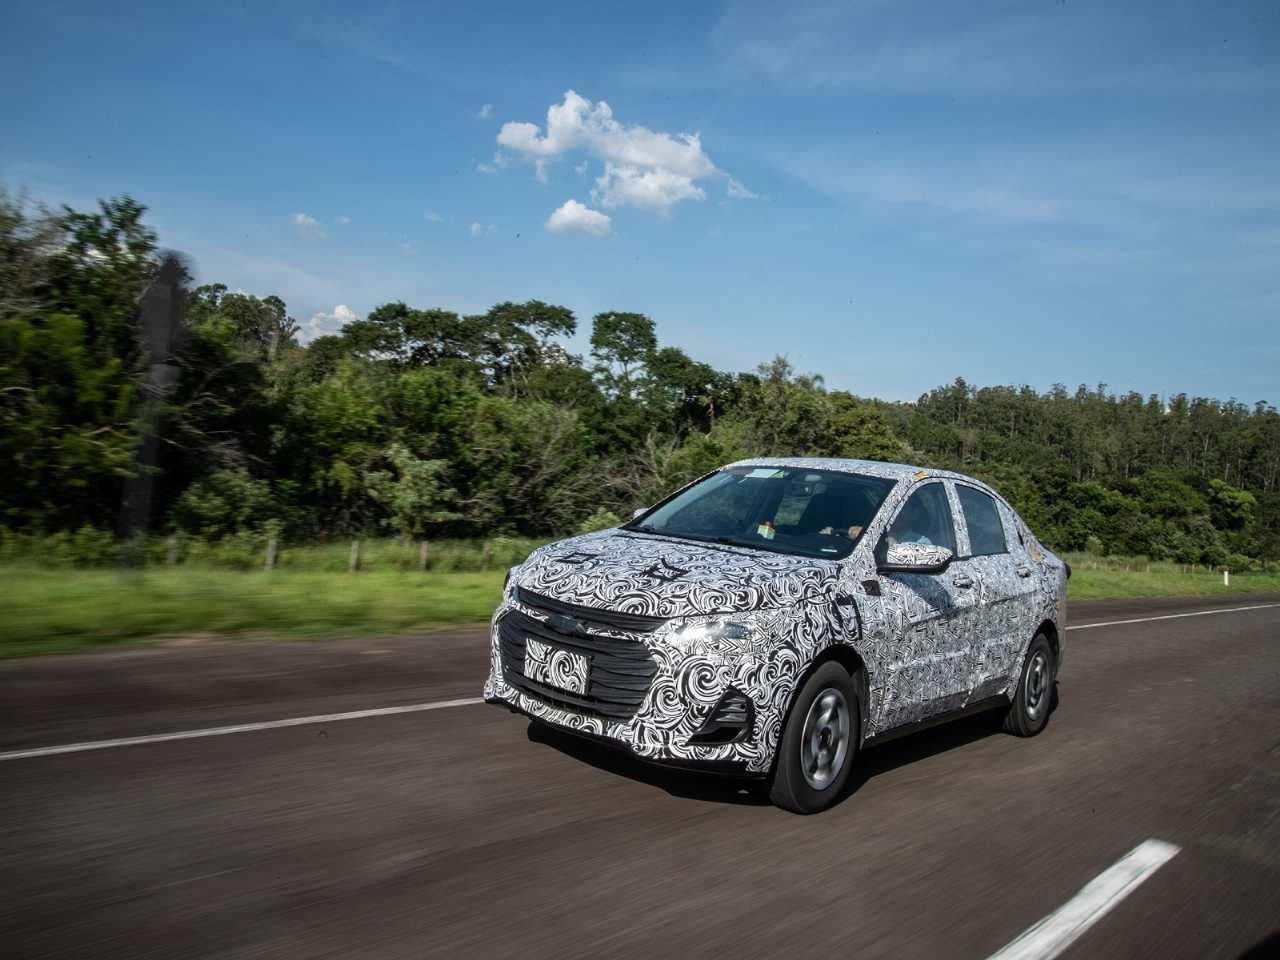 ChevroletPrisma 2020 - ângulo frontal